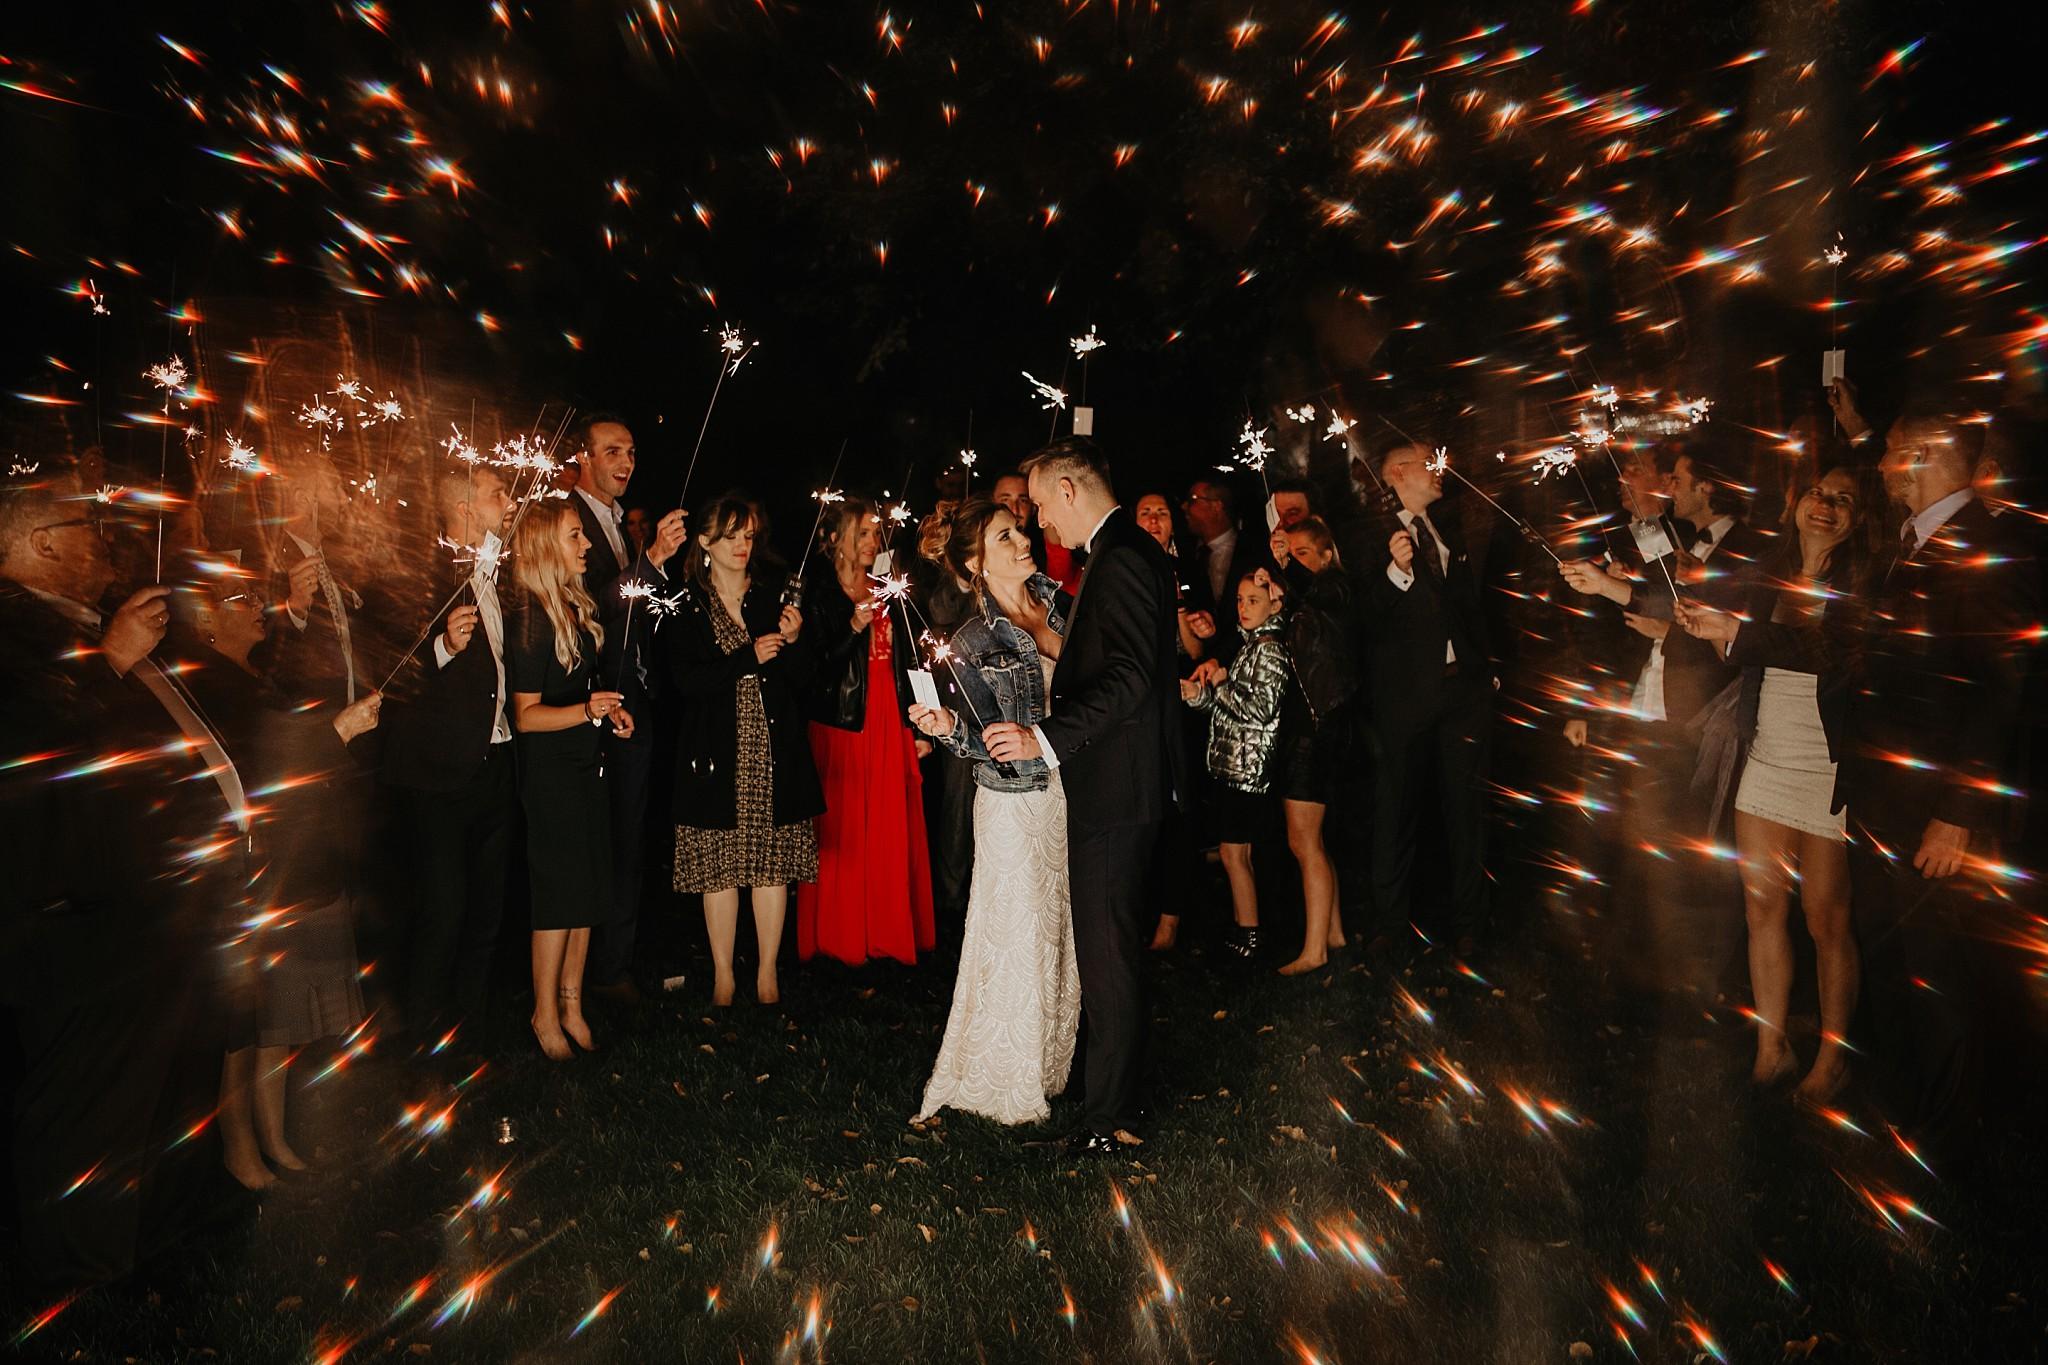 fotograf poznan wesele dobra truskawka piekne wesele pod poznaniem wesele w dobrej truskawce piekna para mloda slub marzen slub koronawirus slub listopad wesele koronawirus 502